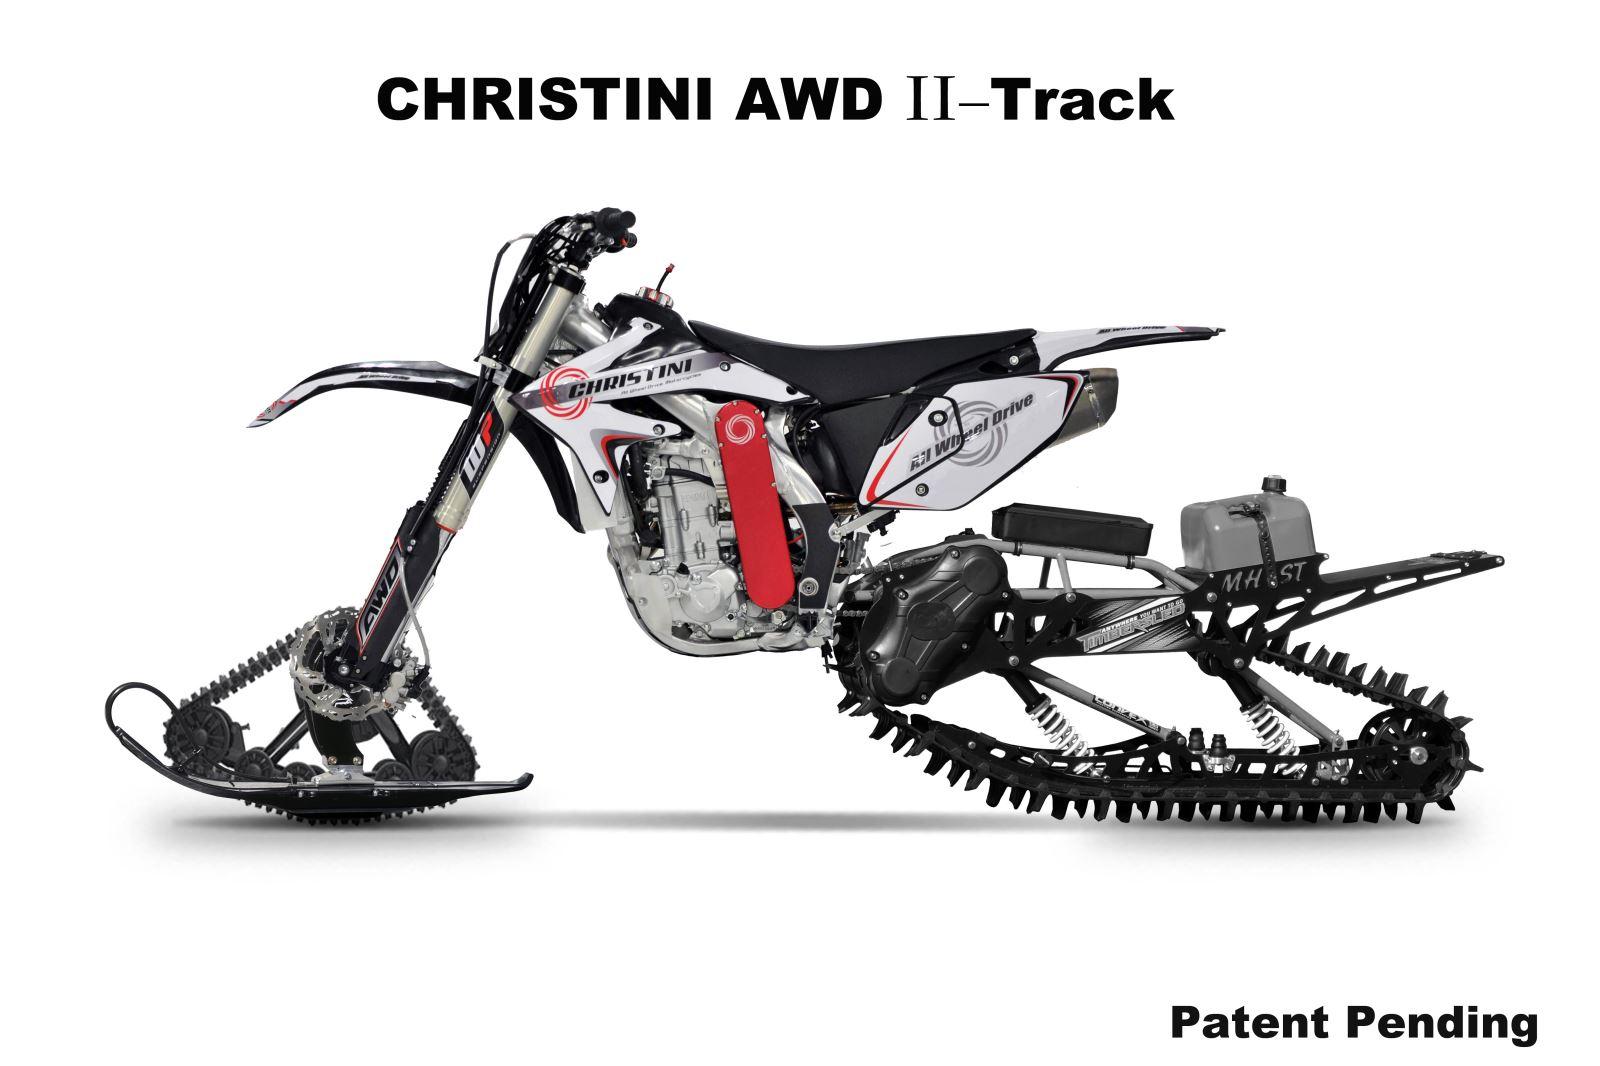 Worlds First Awd Snowbike